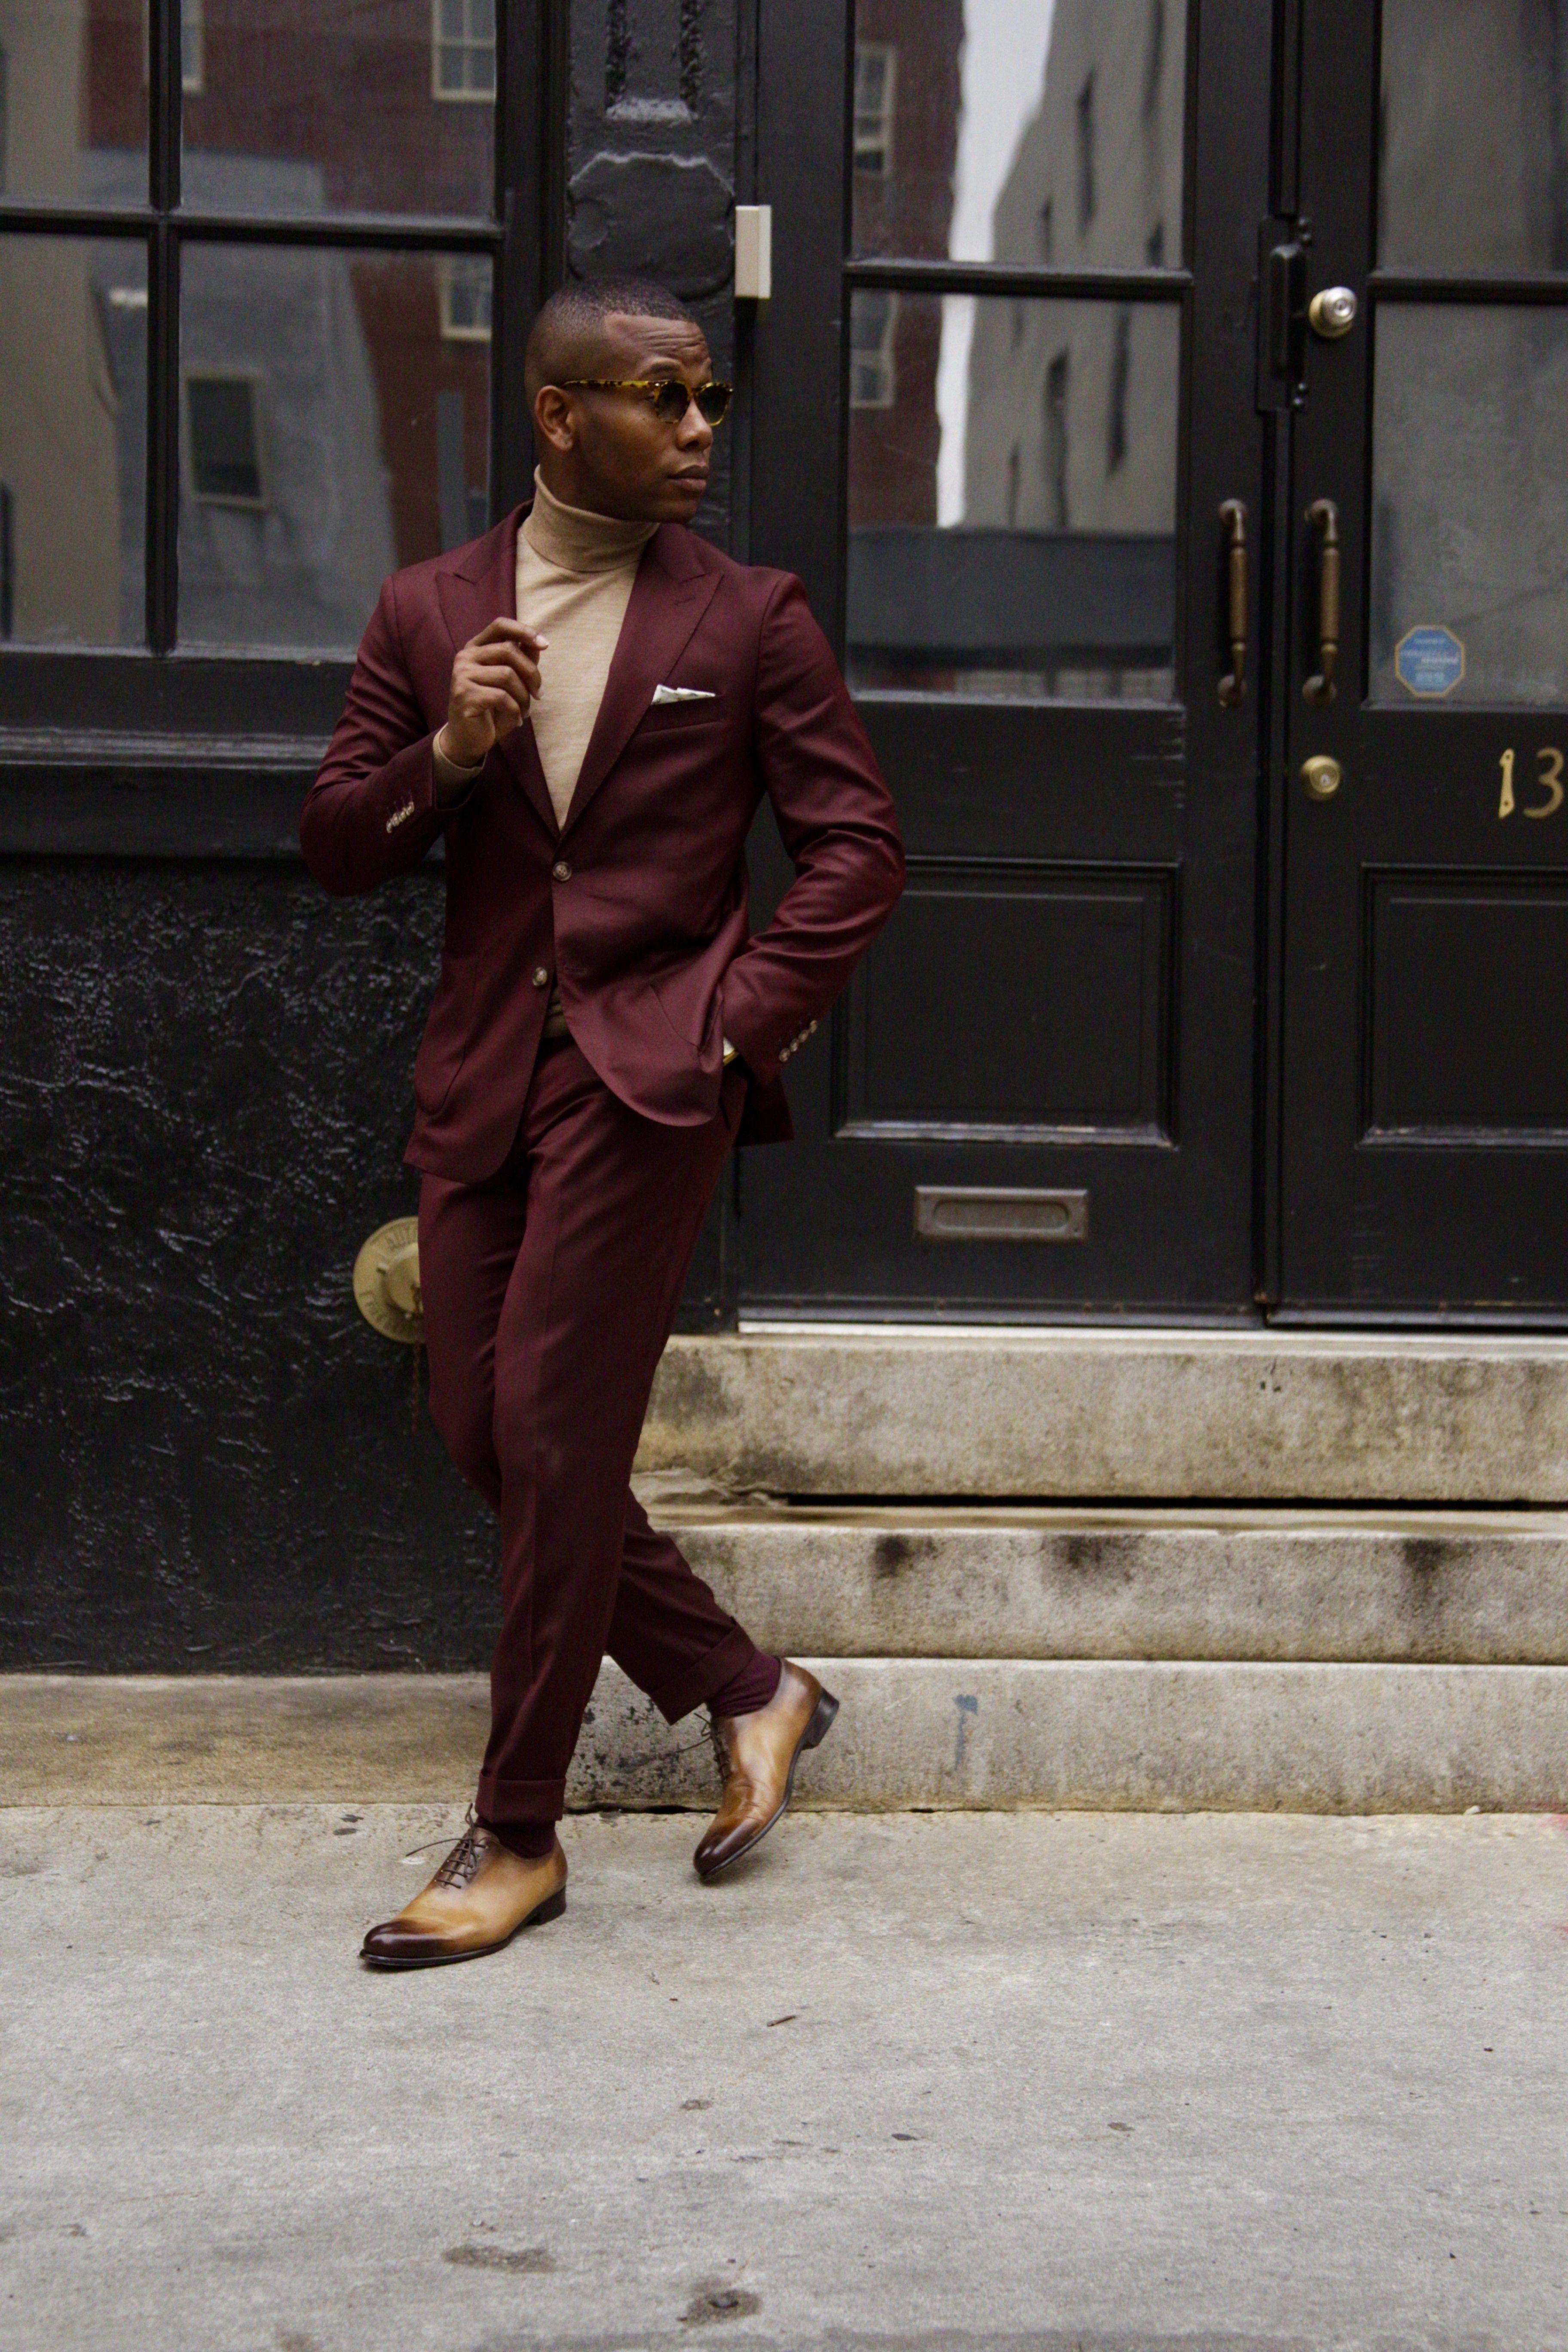 Burgundy Suit Tan Turtleneck Pocket Square Brown Dress Shoes